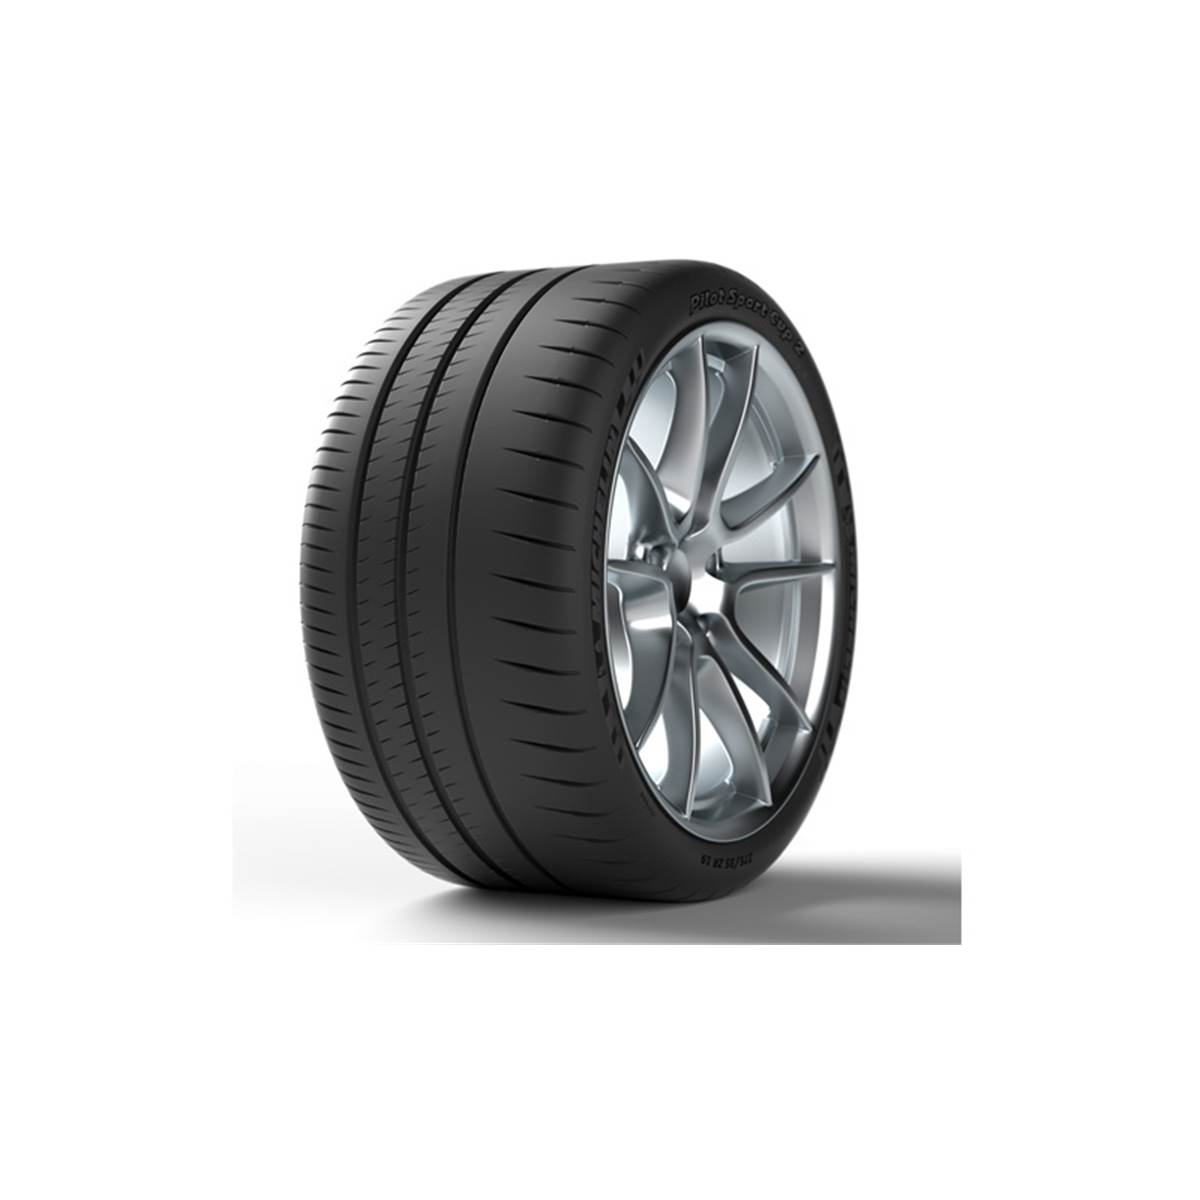 Pneu Michelin 295/30R19 100Y Pilot Sport Cup 2 XL